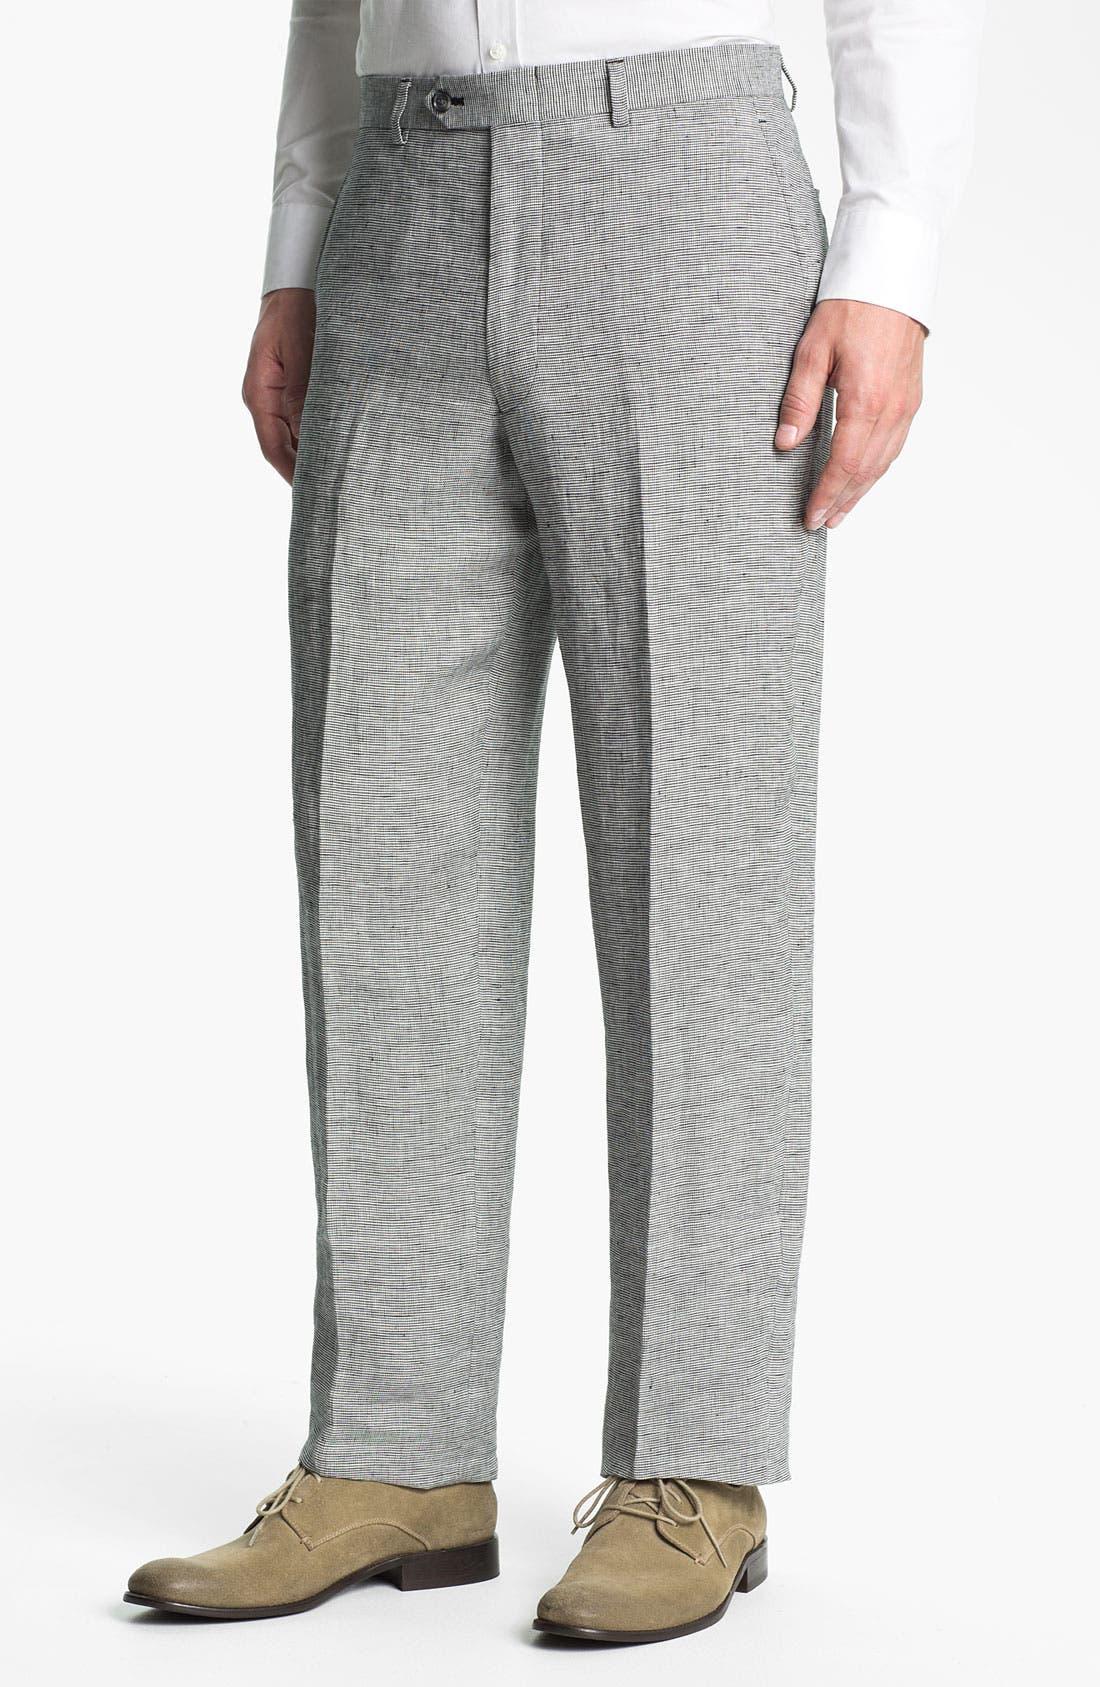 Alternate Image 1 Selected - John W. Nordstrom® Flat Front Linen Trousers